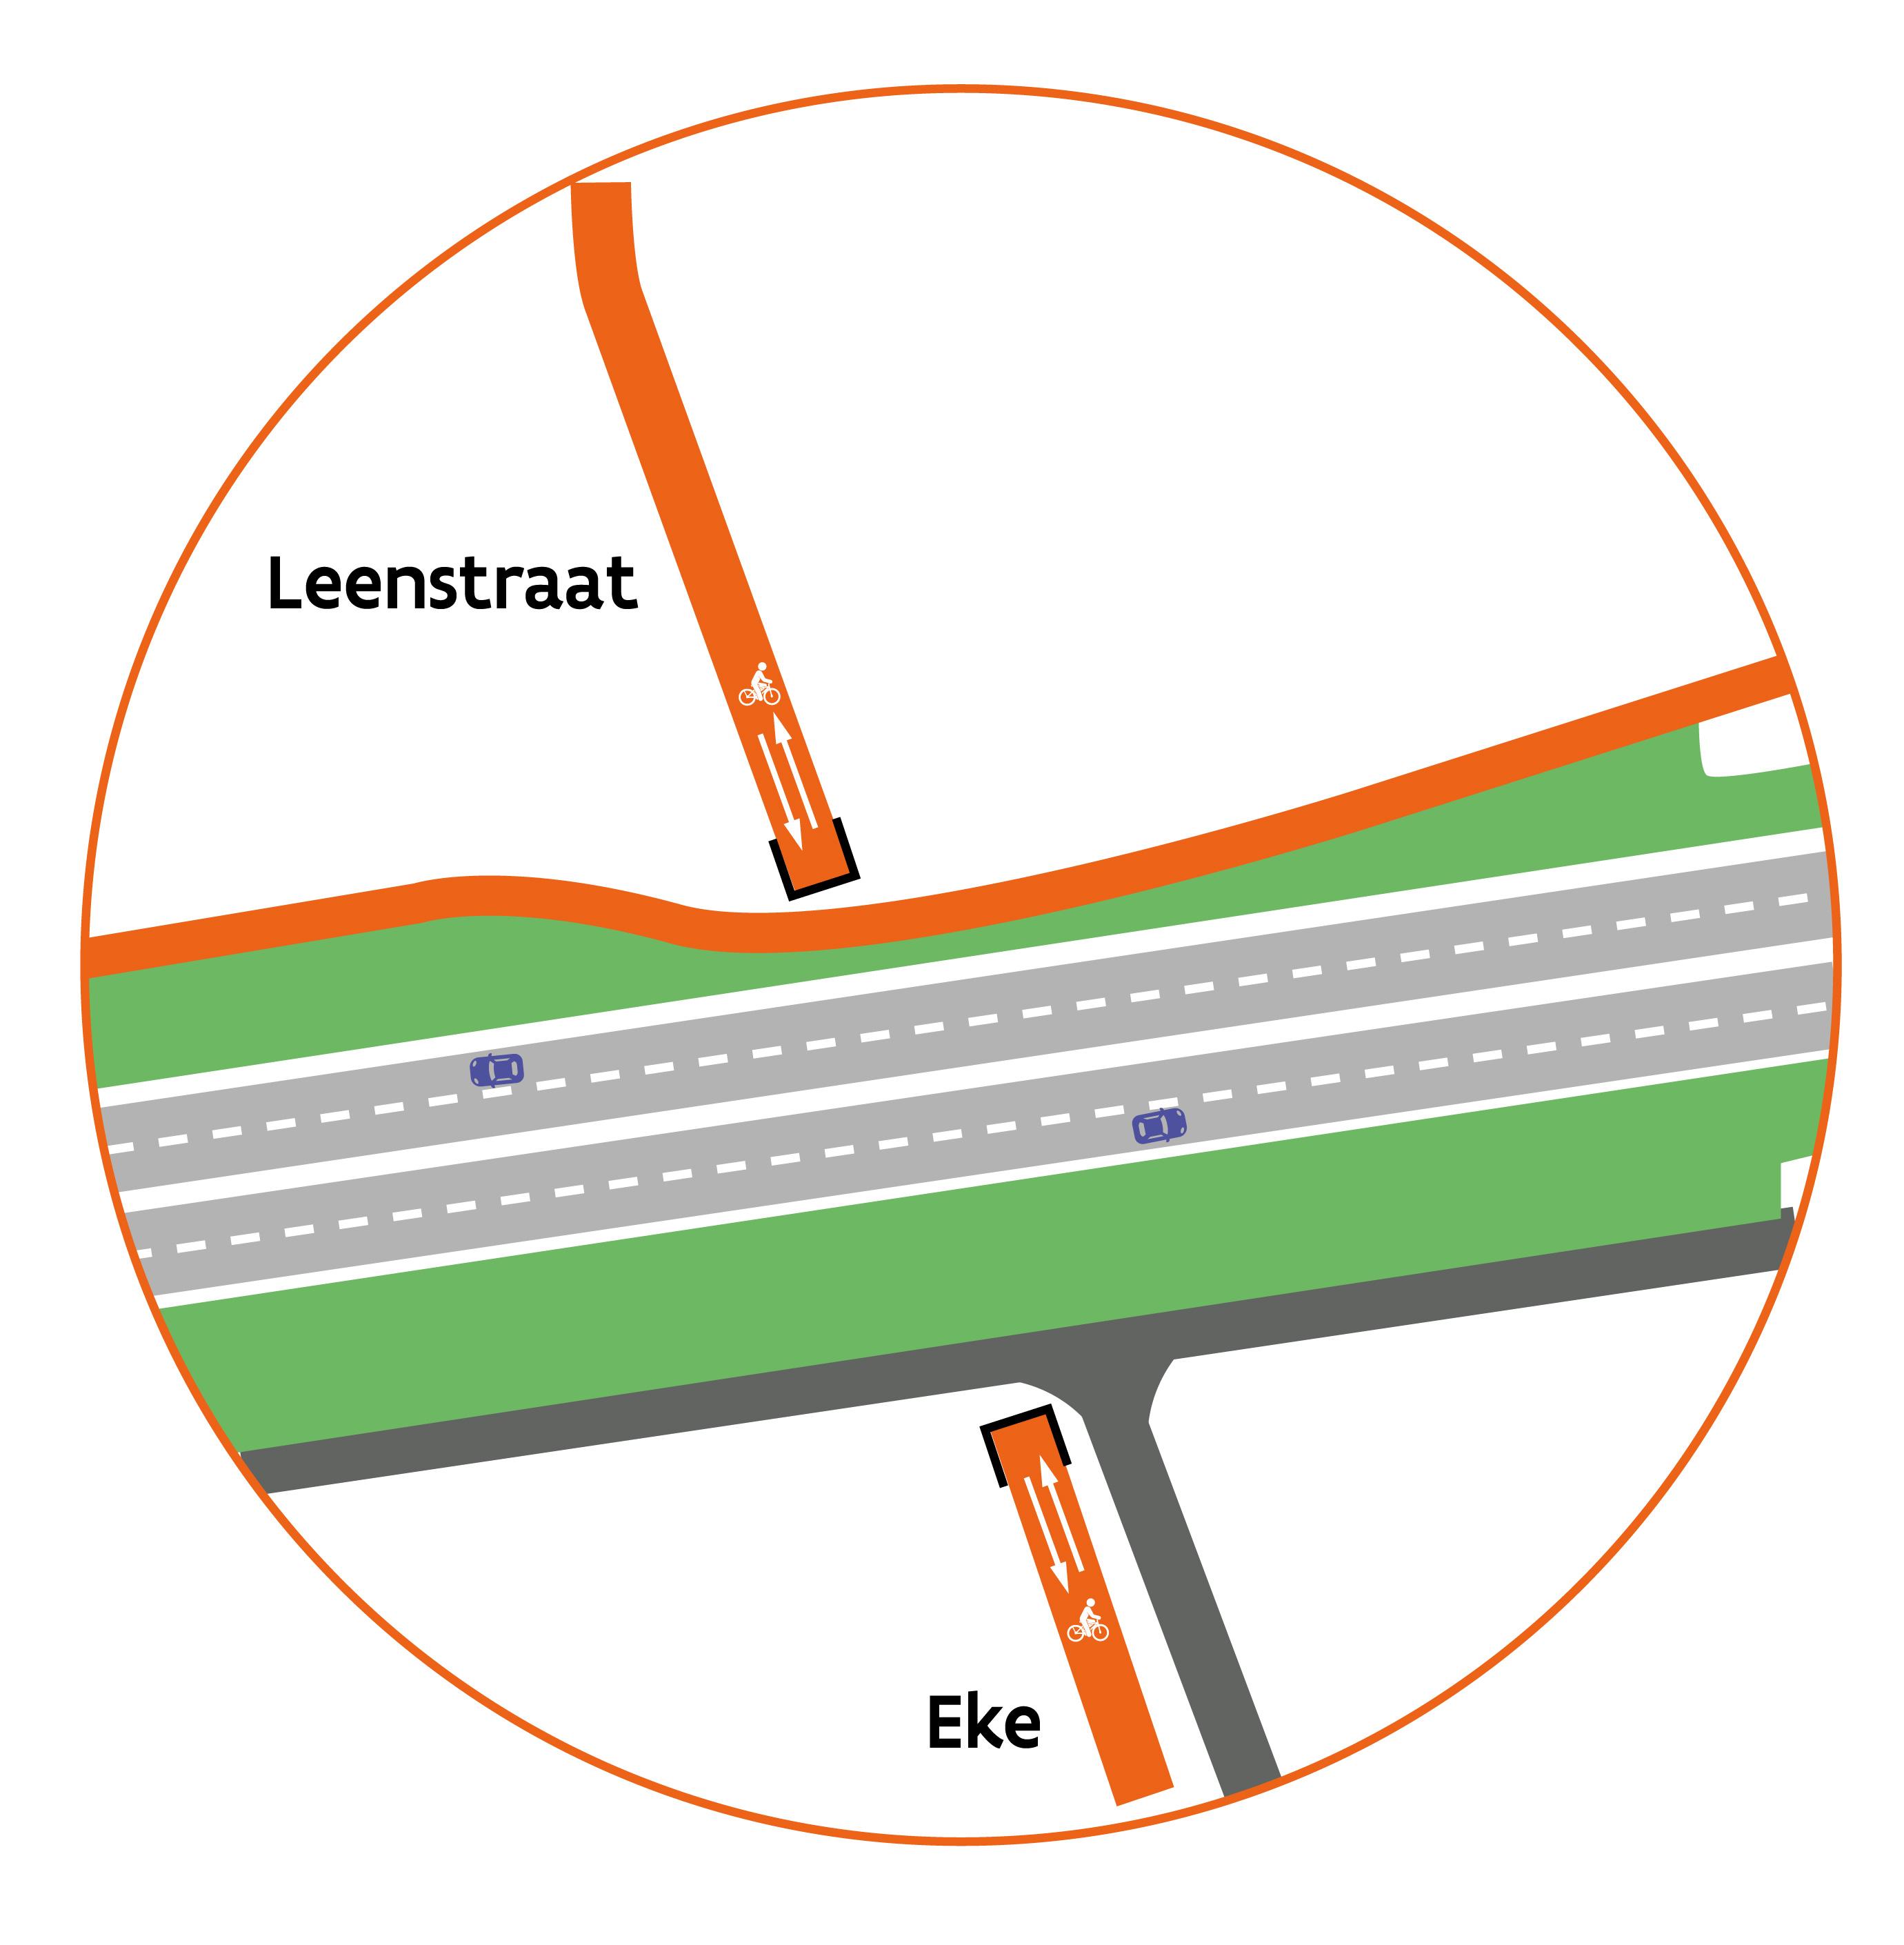 https://wegenenverkeer.be/sites/default/files/images/detail_fietstunnel-01.jpg